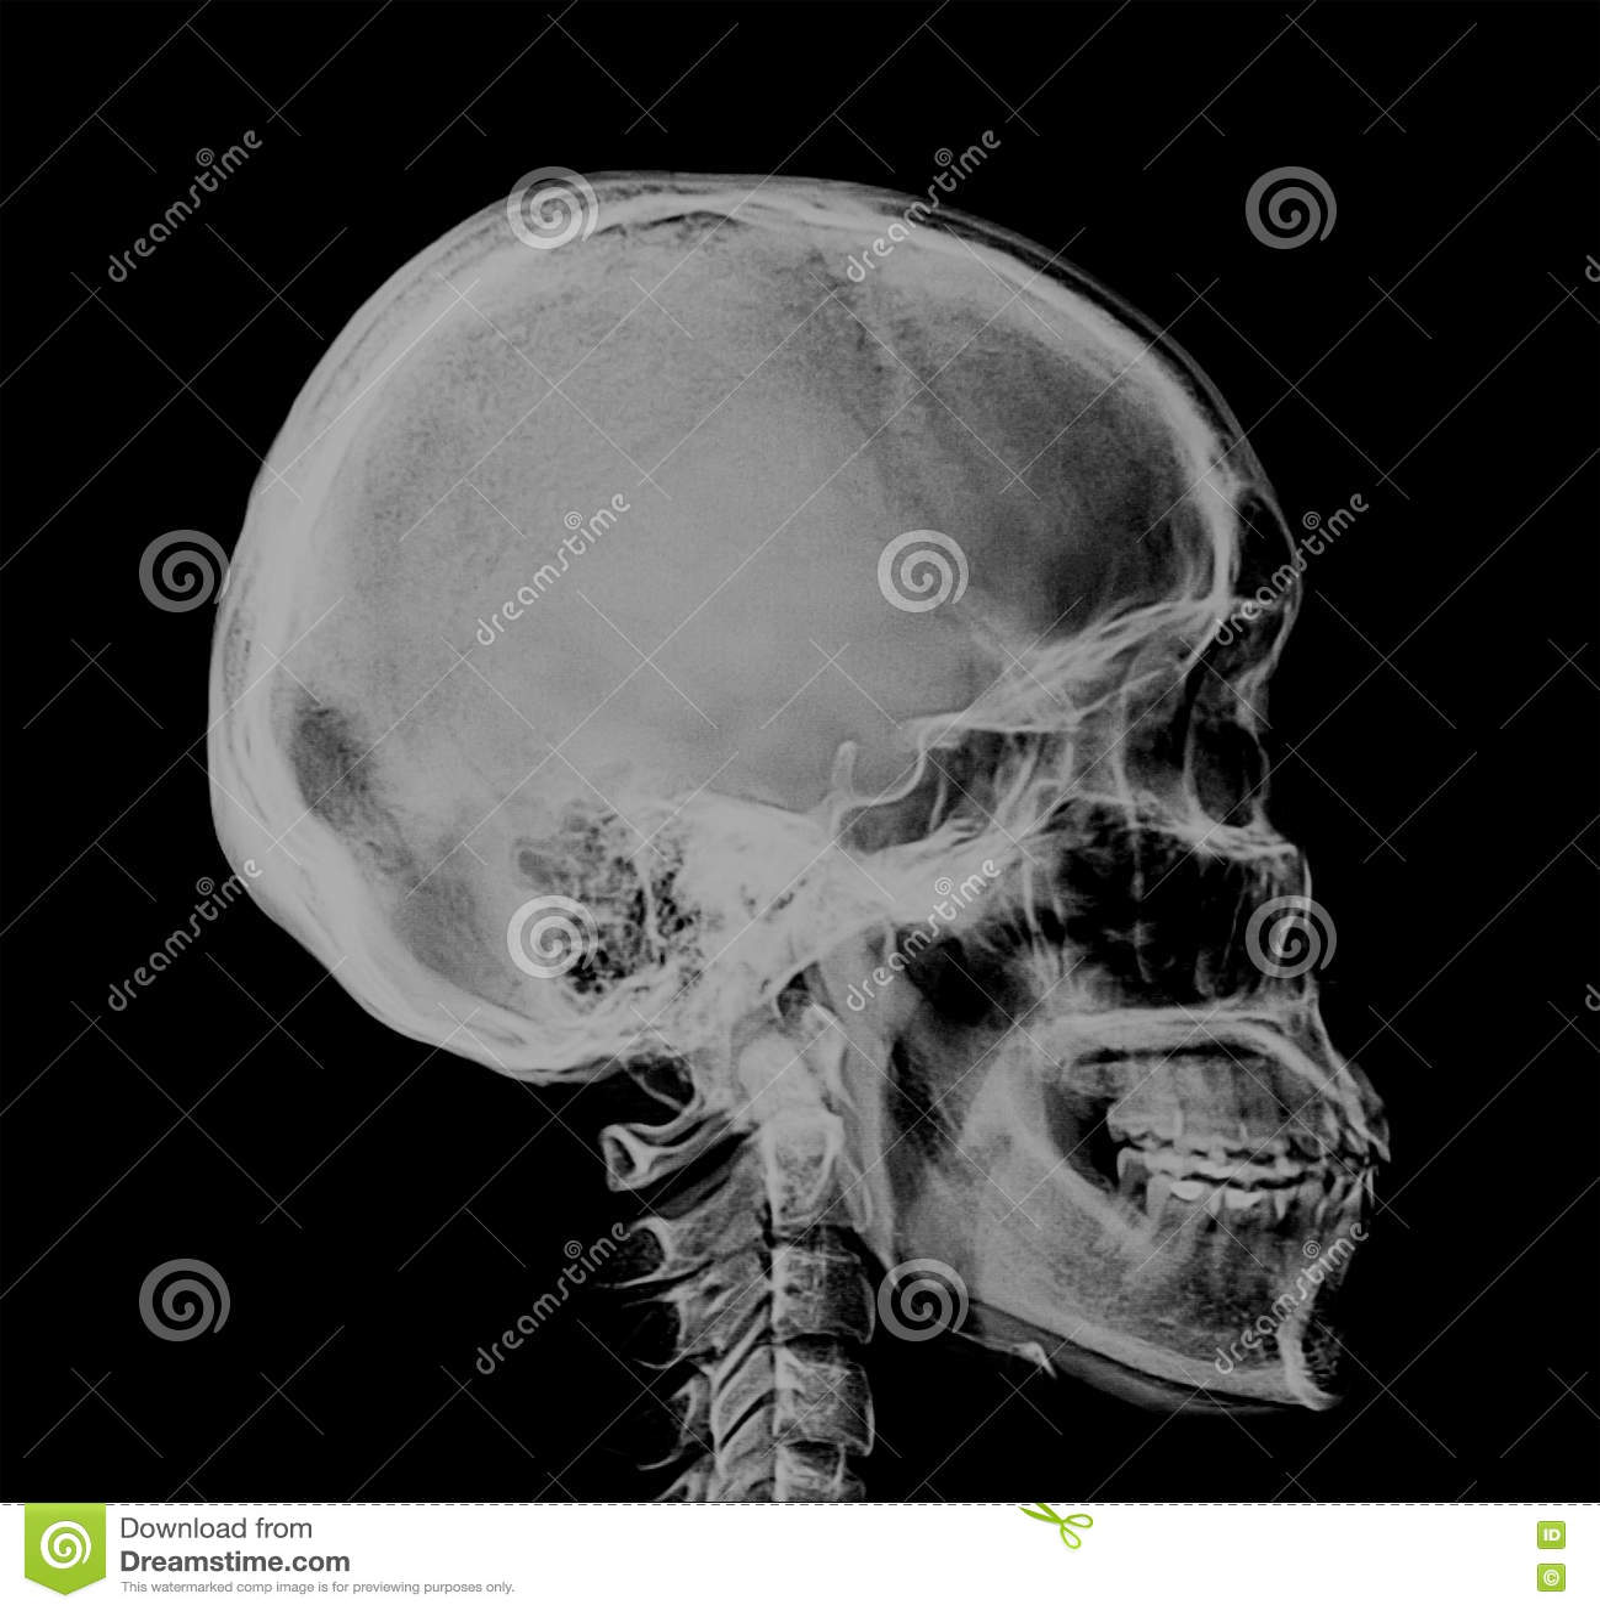 Human Skull Xray Negative Scan